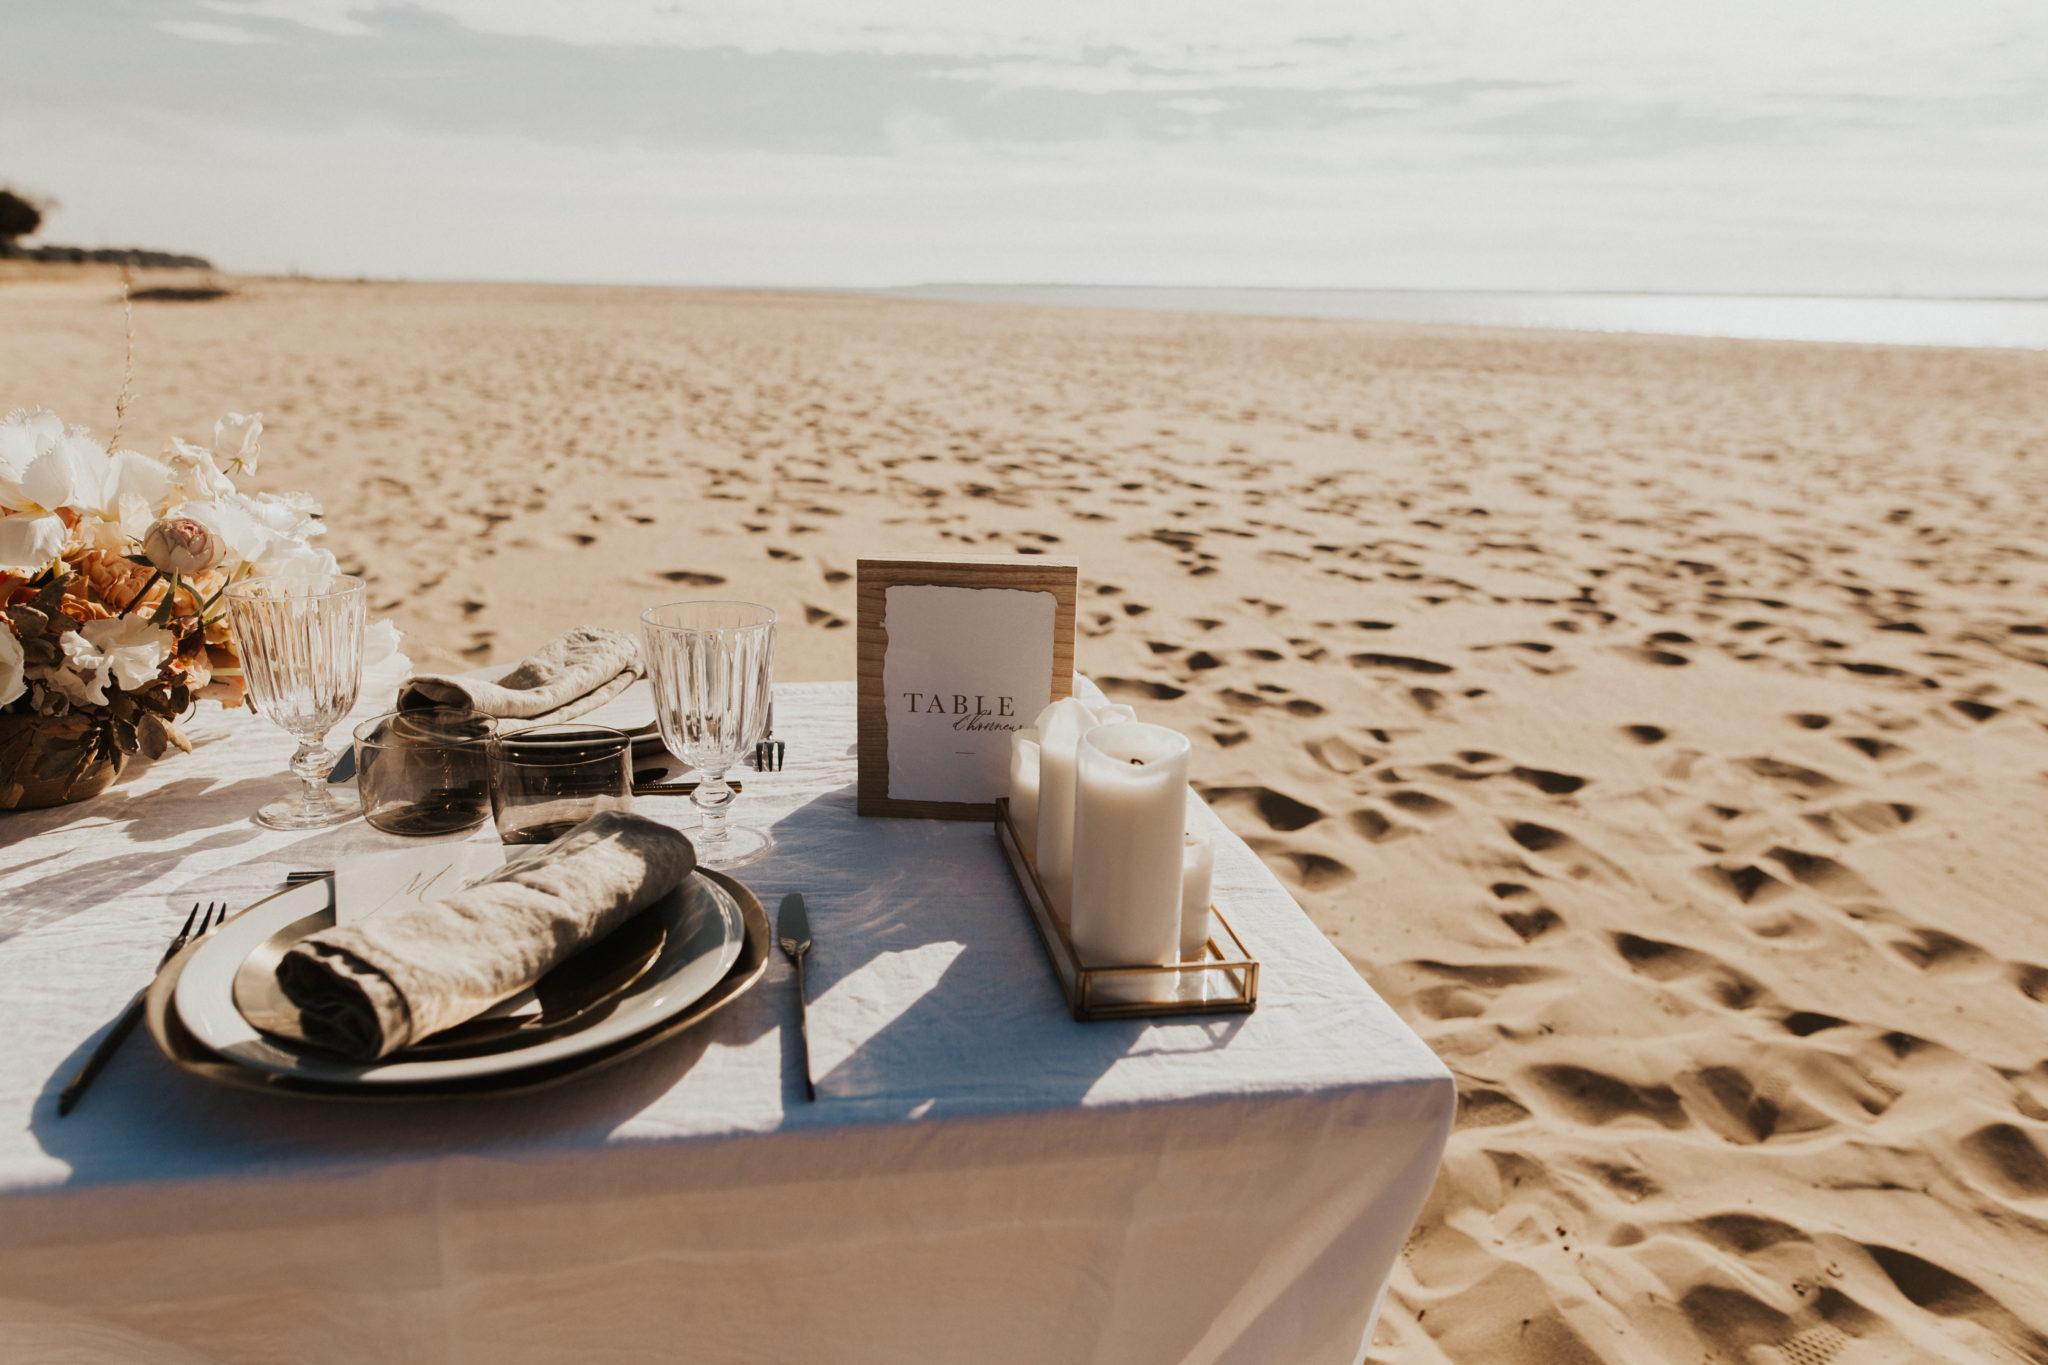 bassin-arcachon-mariage-inspiration-repas-plage